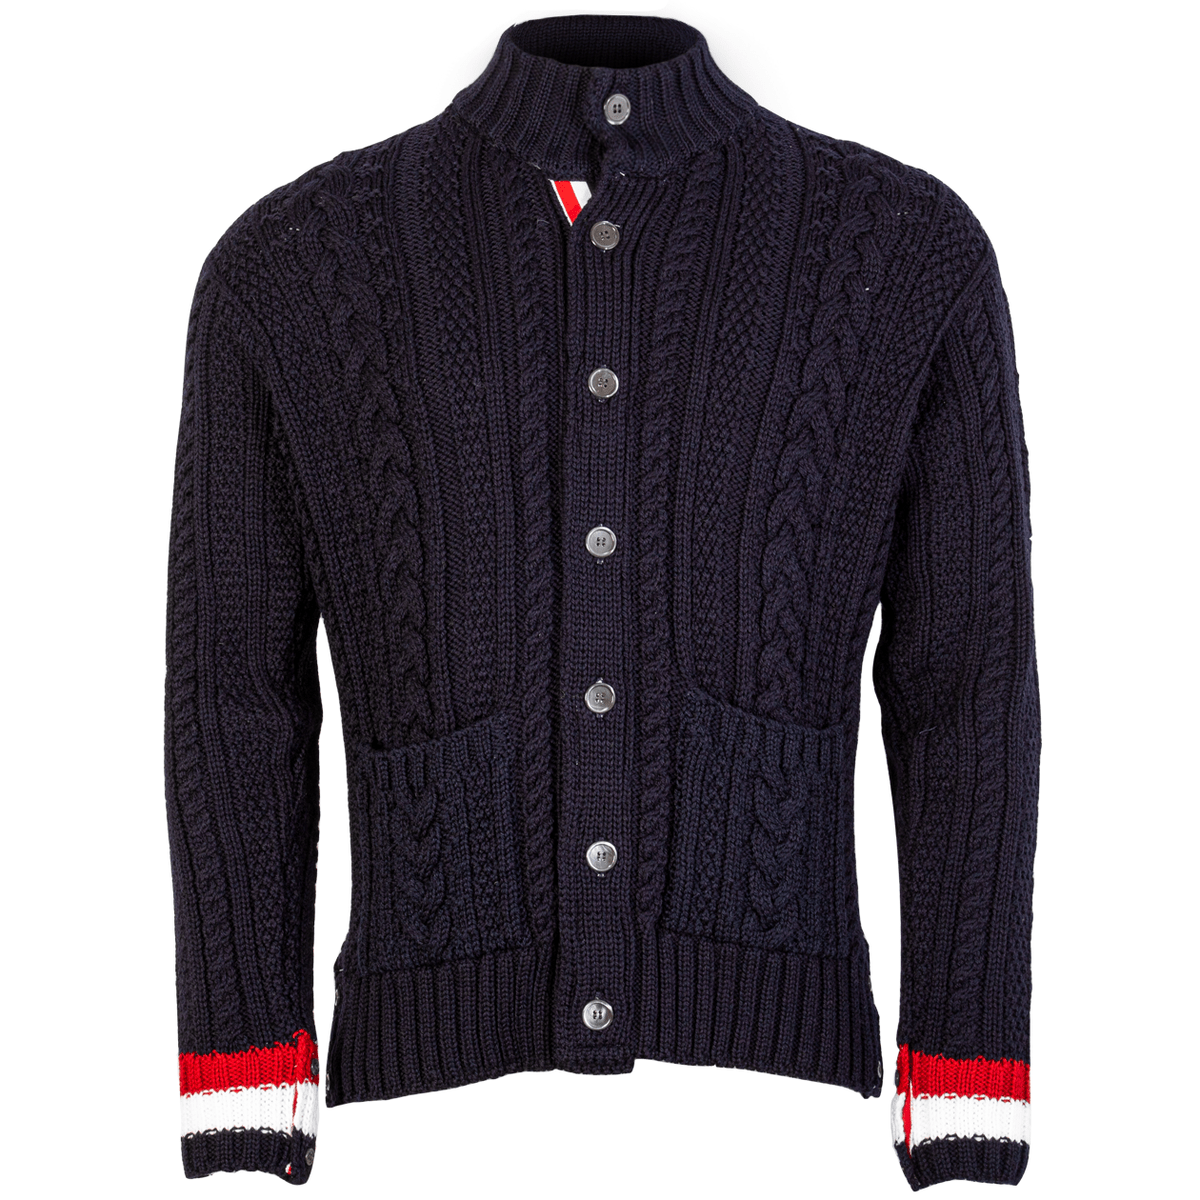 Button Up Cable Knit Aran Cardigan